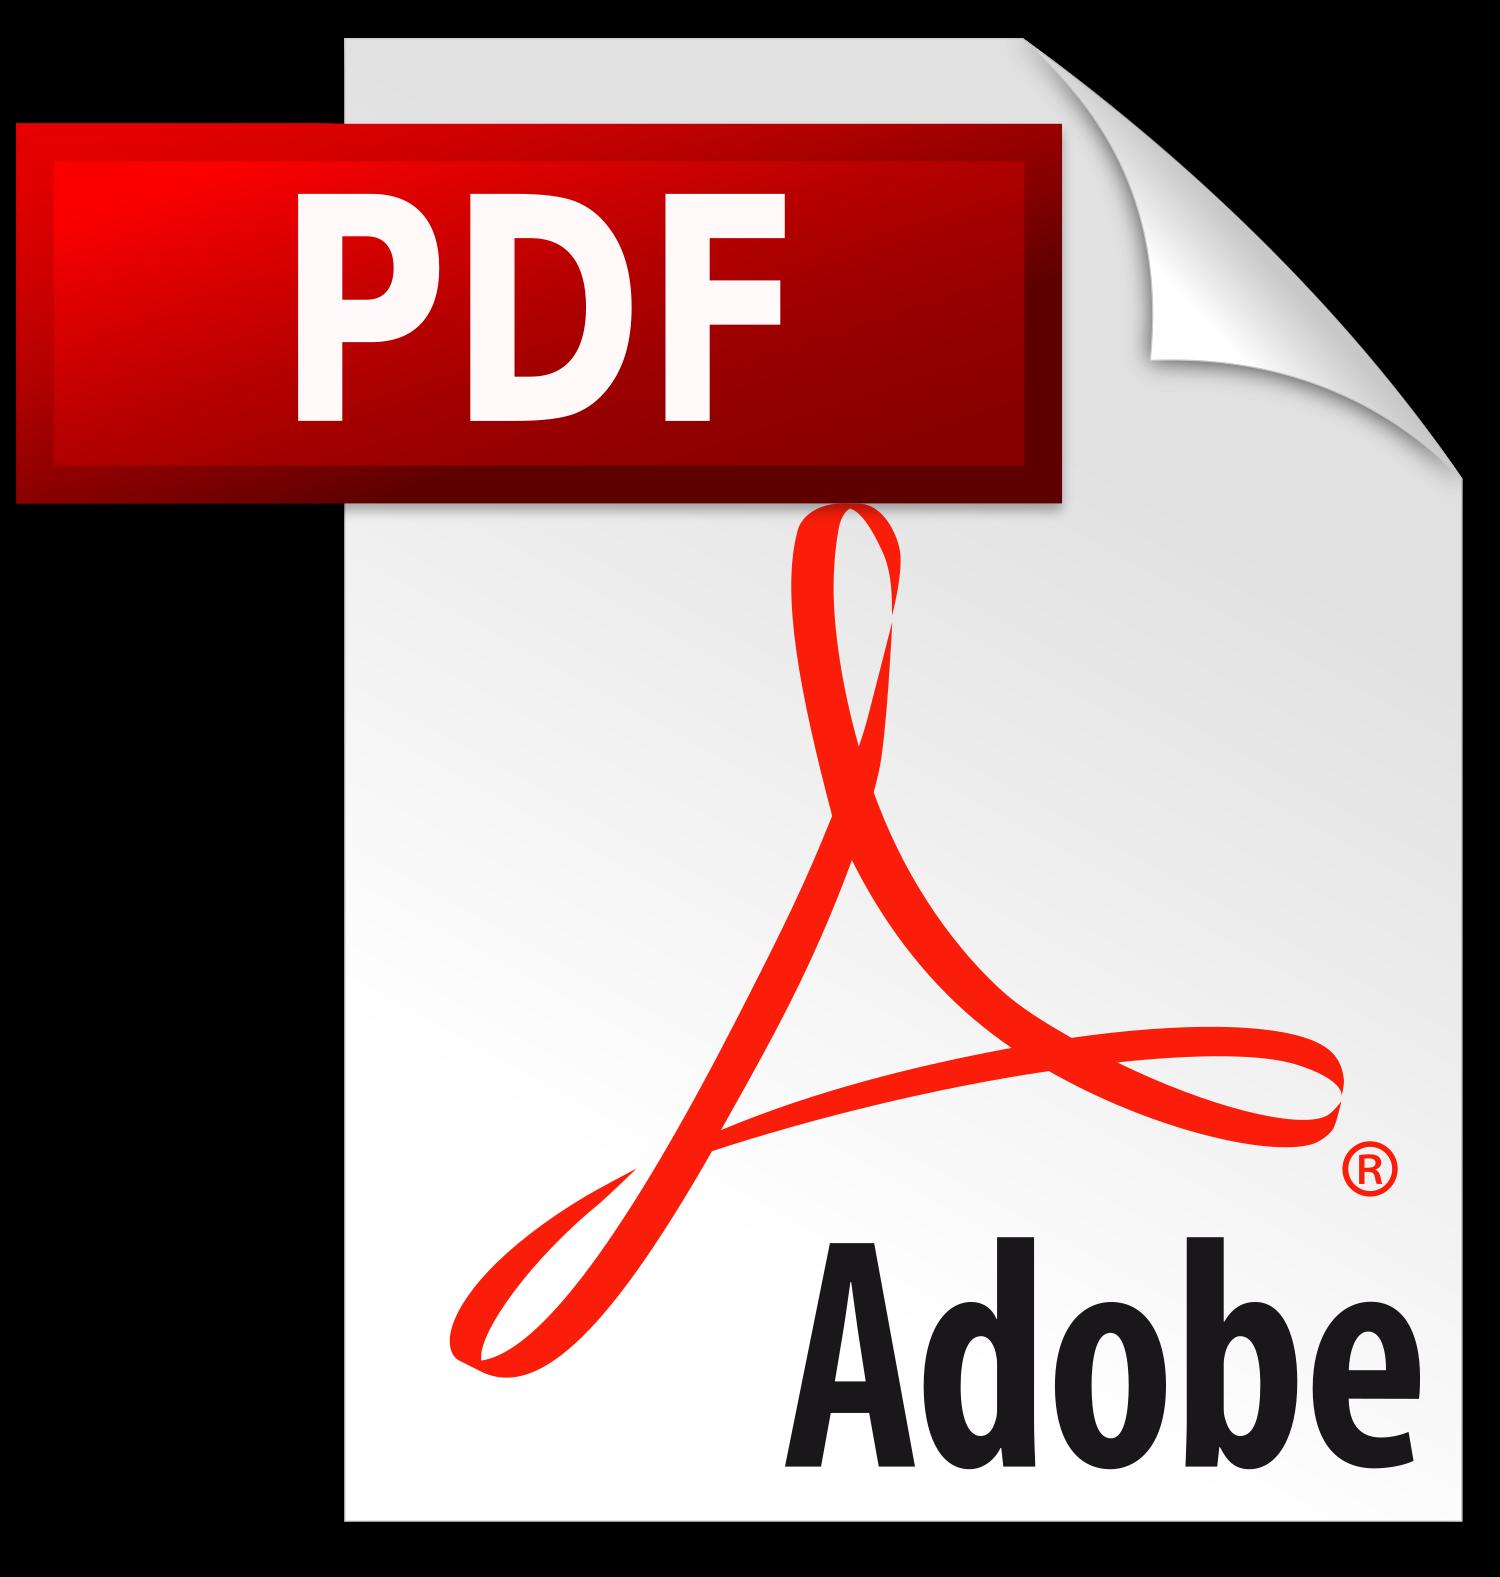 adobe-pdf-icone-2